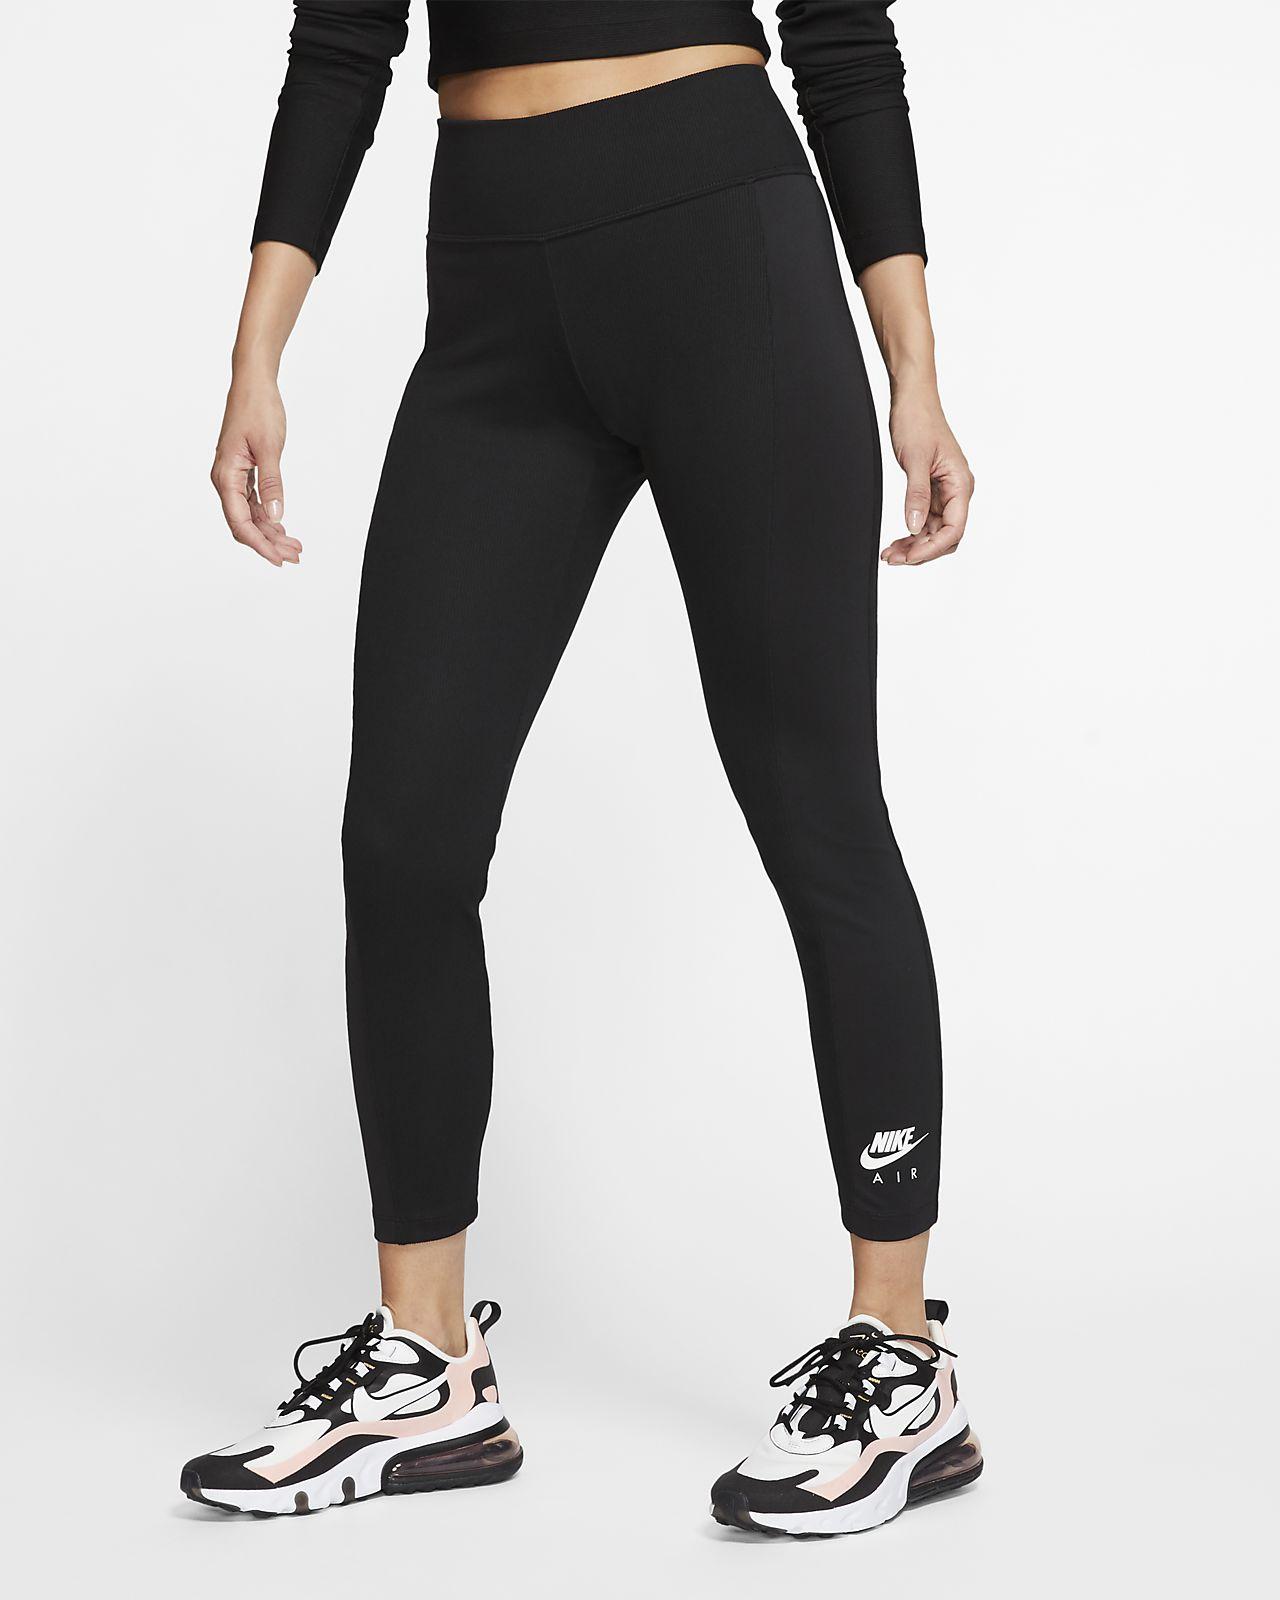 Nike High Waisted Running Leggings Outlet Online 40a71 8b014